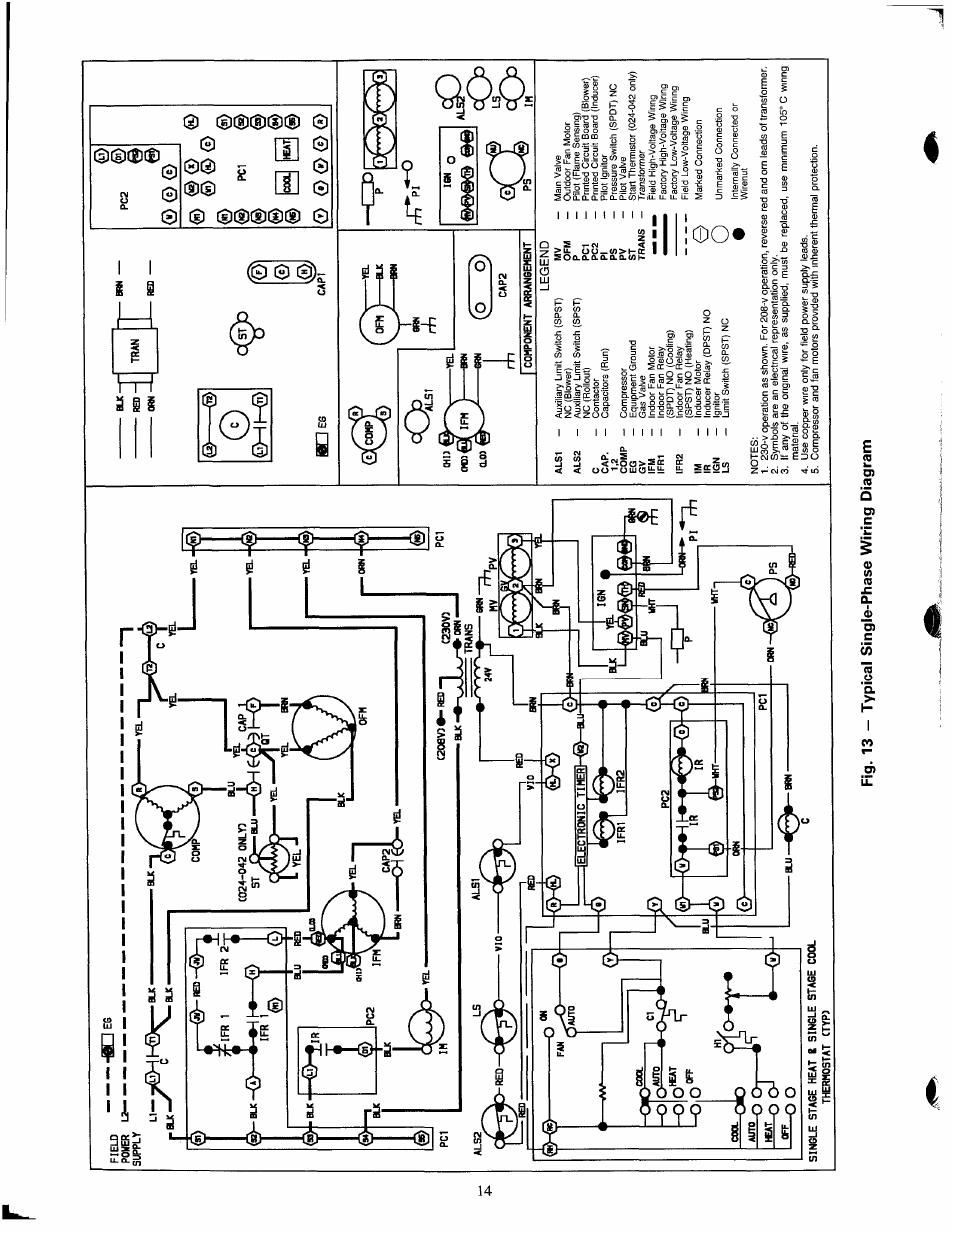 [DIAGRAM] Basic Hvac Indoor Blower Fan Capacitor Wiring